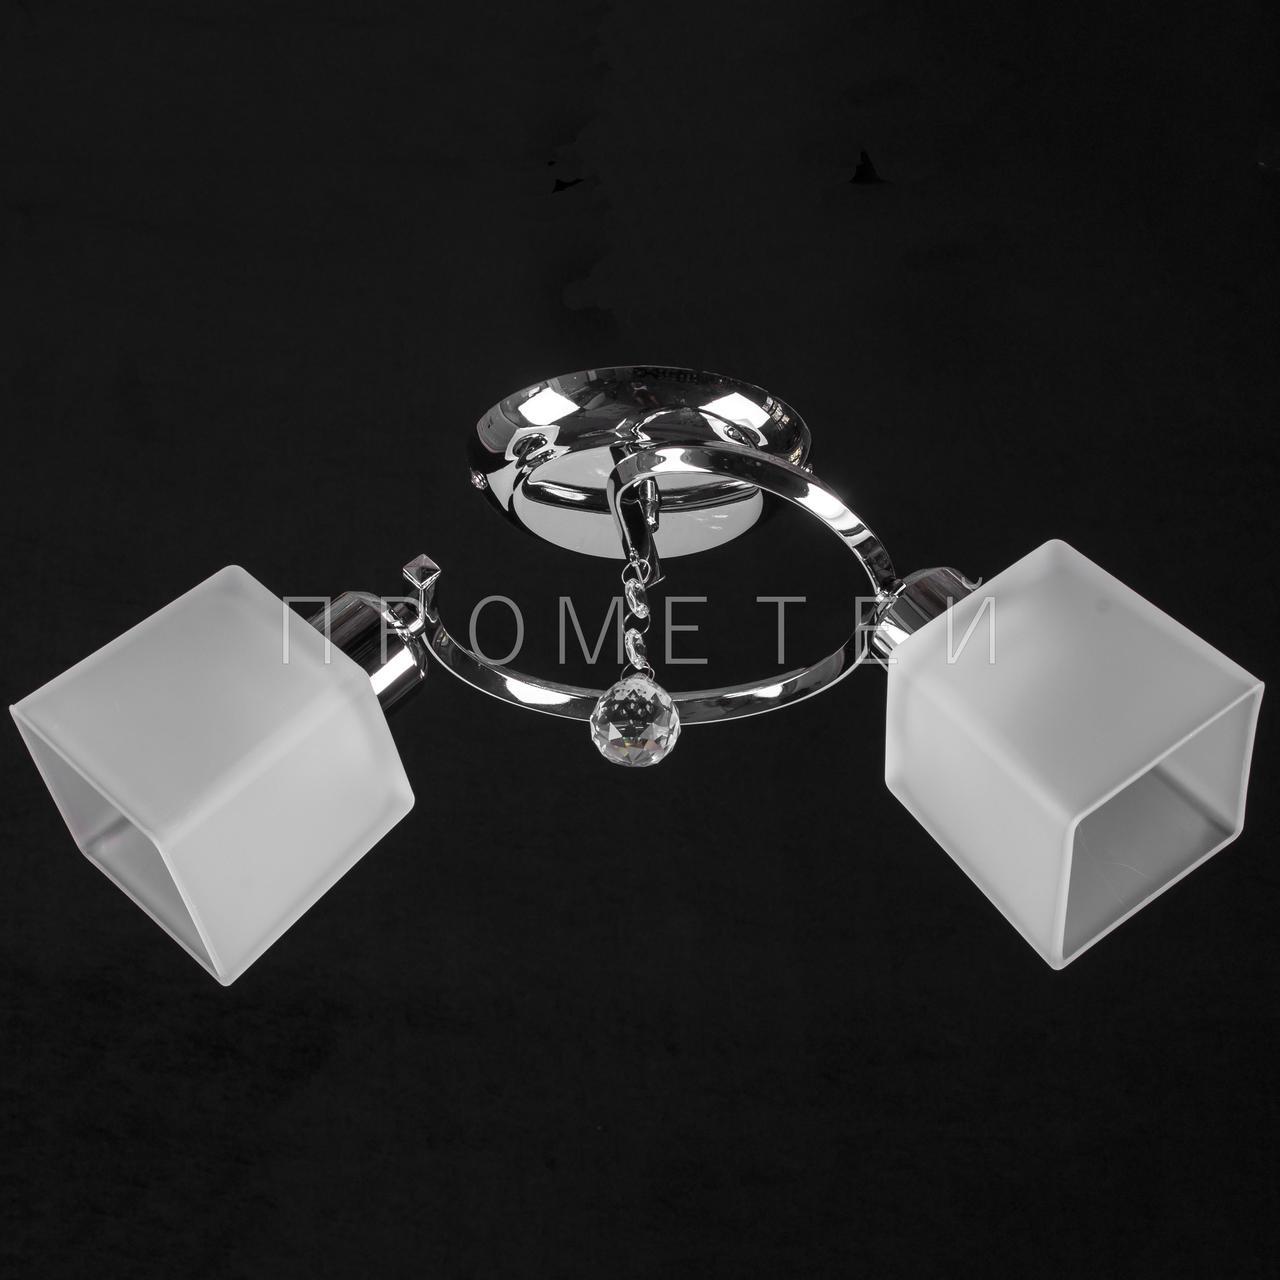 Люстра Припотолочная на дві лампочки (нікель)P3-7195/2C/CR+WT